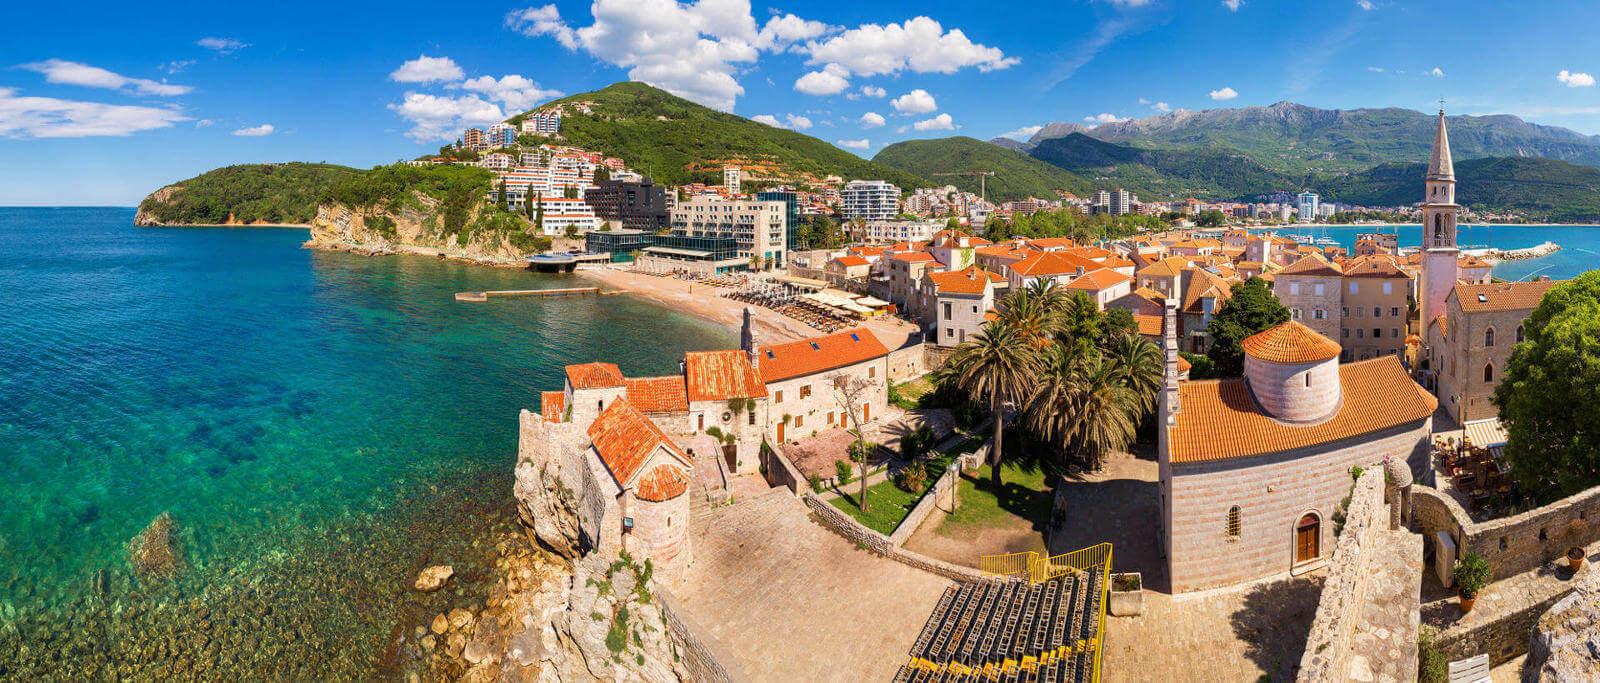 Montenegro 'calls' Russian tourists